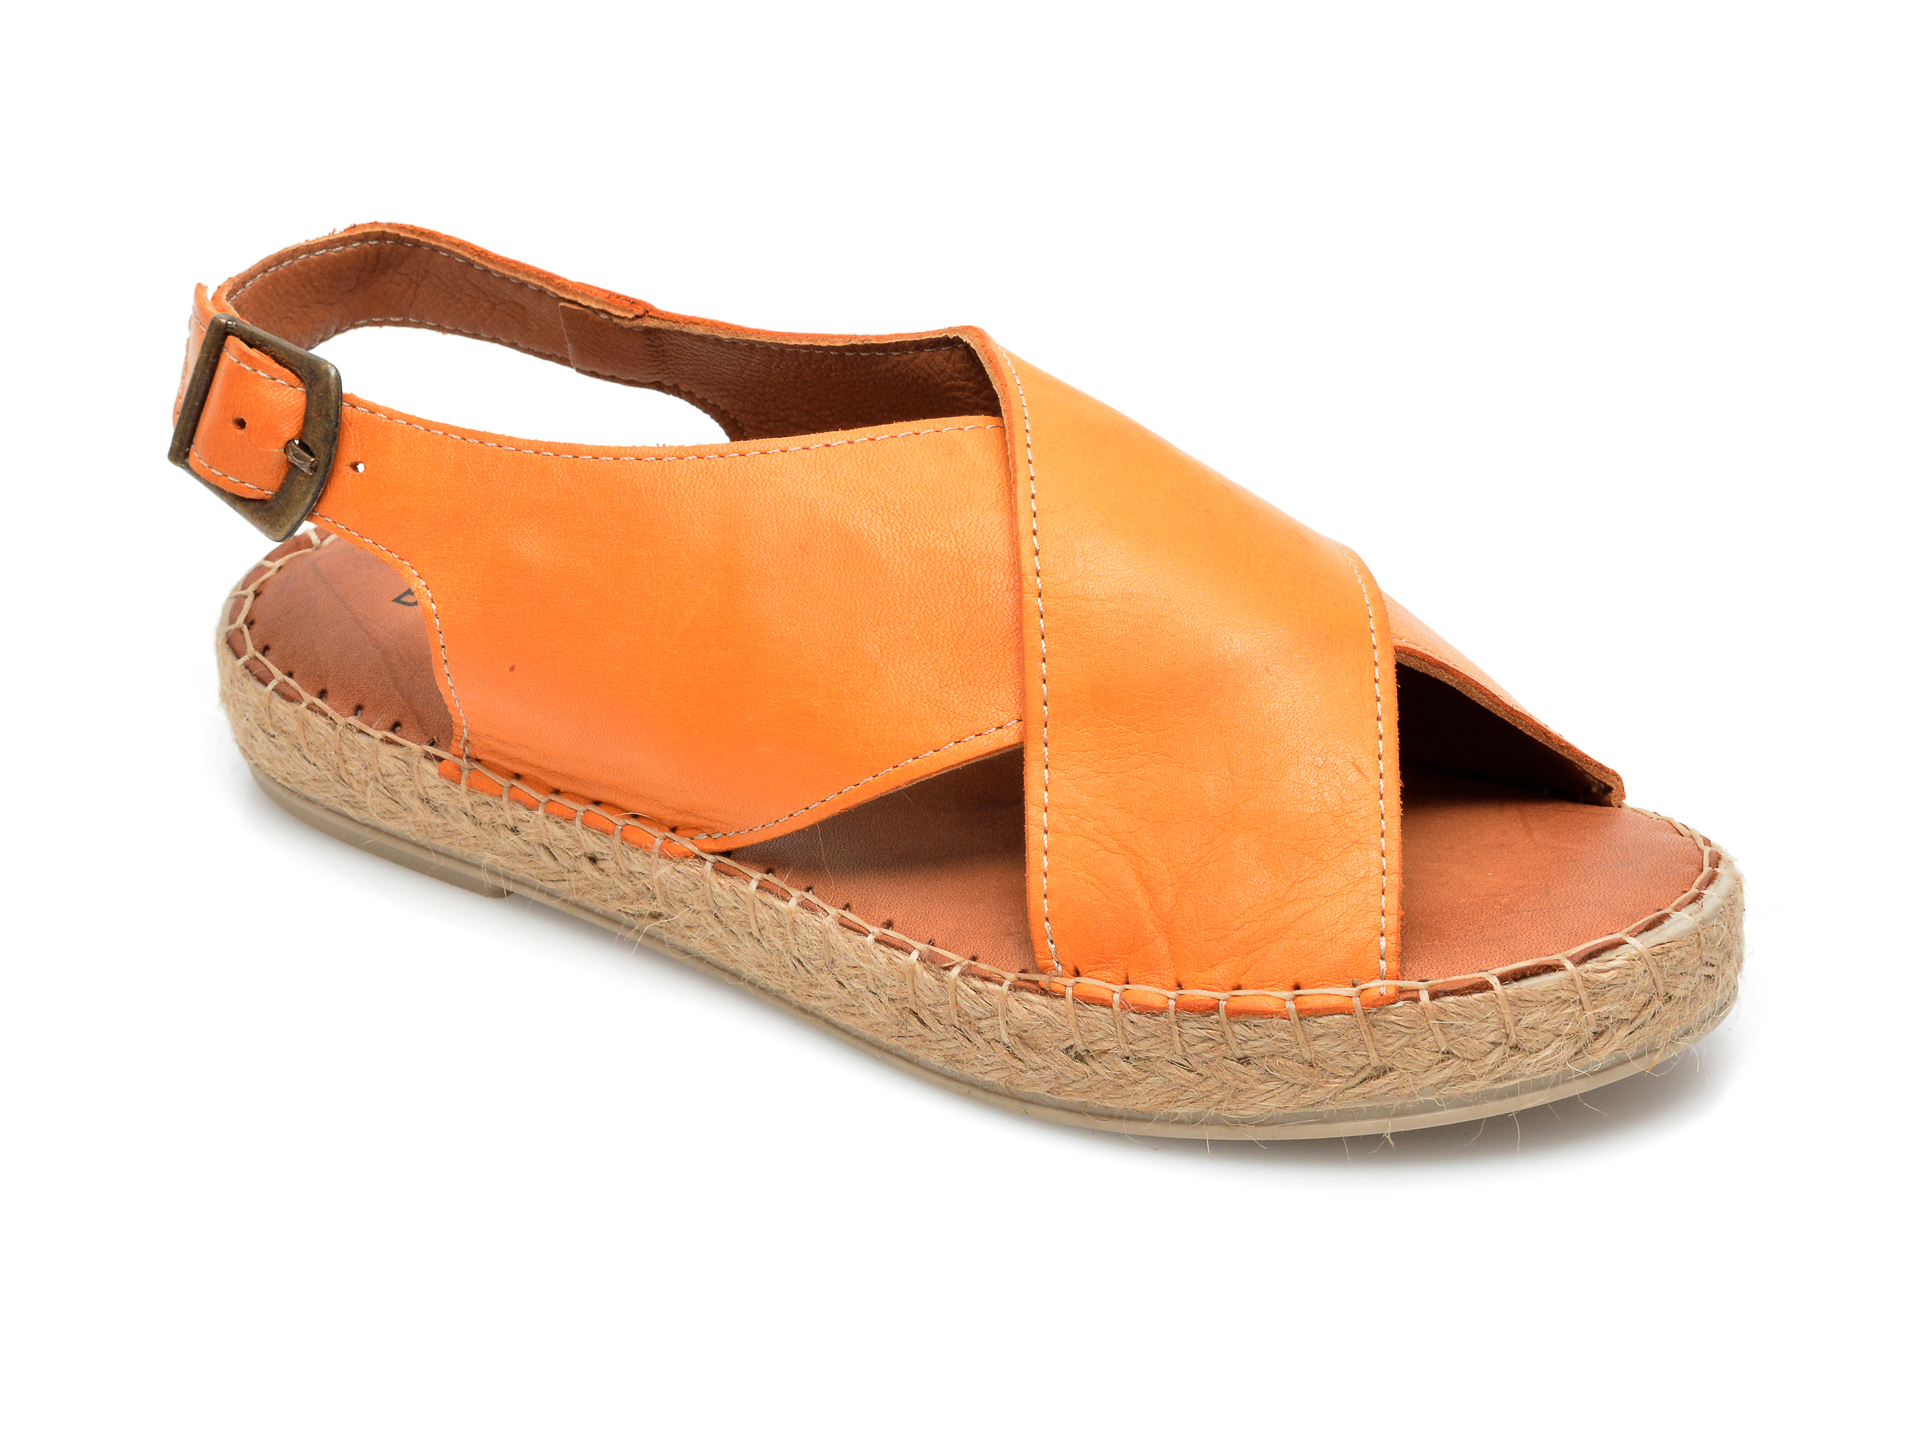 Sandale BABOOS portocalii, R05, din piele naturala imagine otter.ro 2021